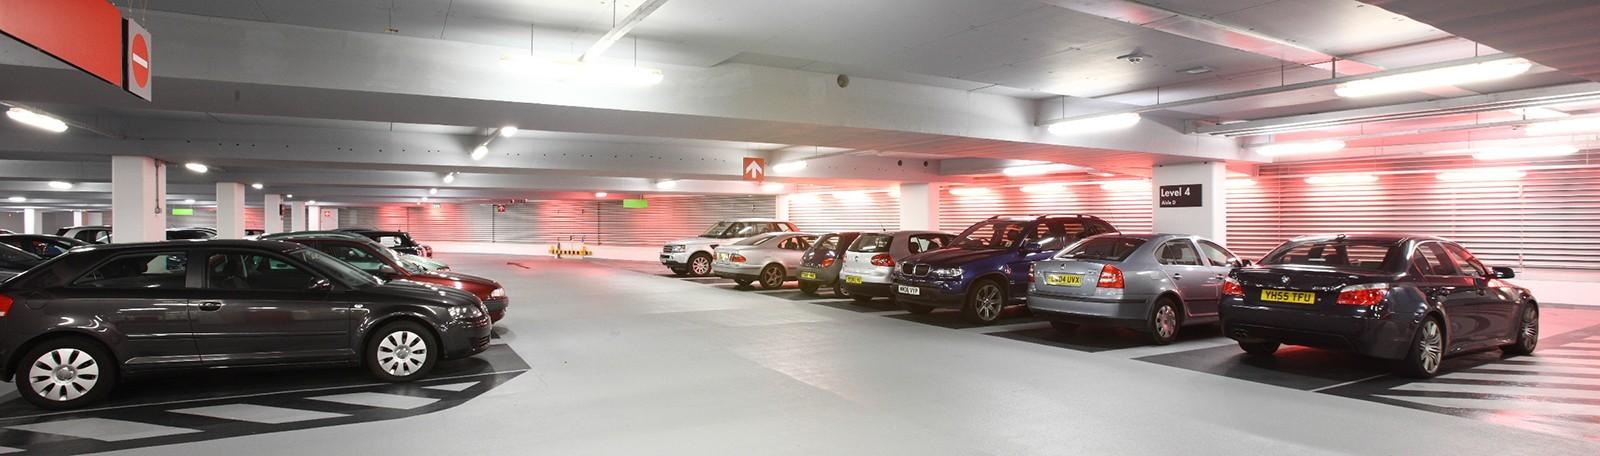 Parking Valence Gare - Rue Denis Papin 26000 Valence